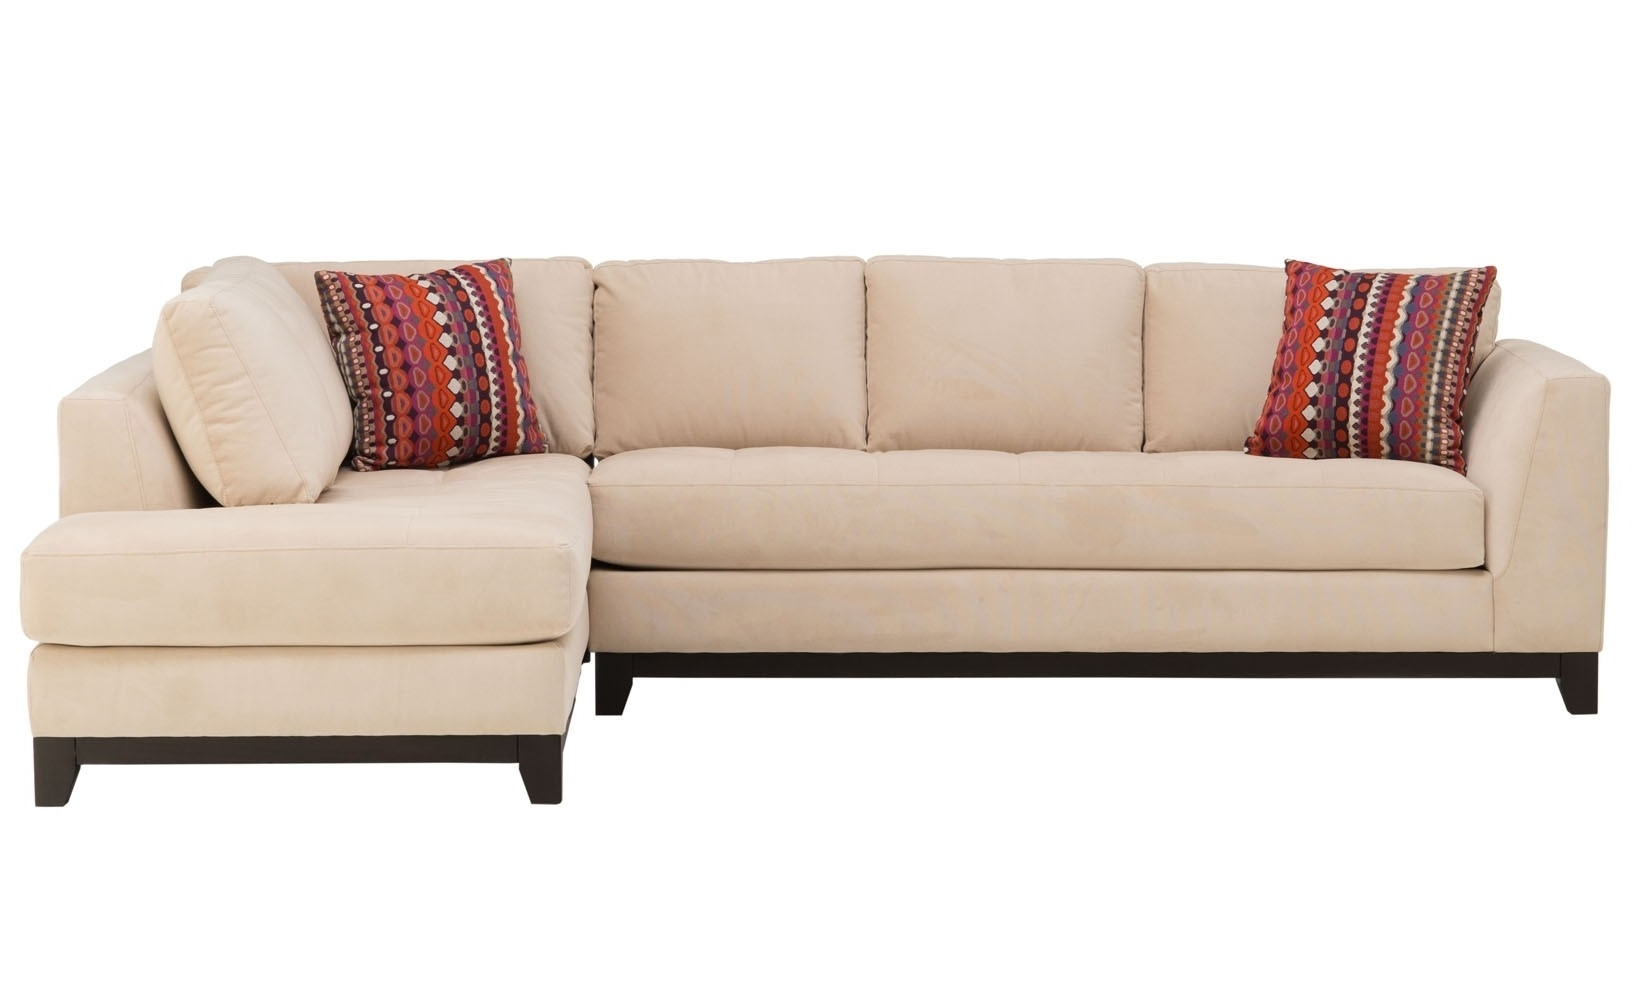 2018 Minneapolis Sectional Sofas With Regard To Unique Sectional Sofa Minneapolis – Buildsimplehome (View 1 of 15)